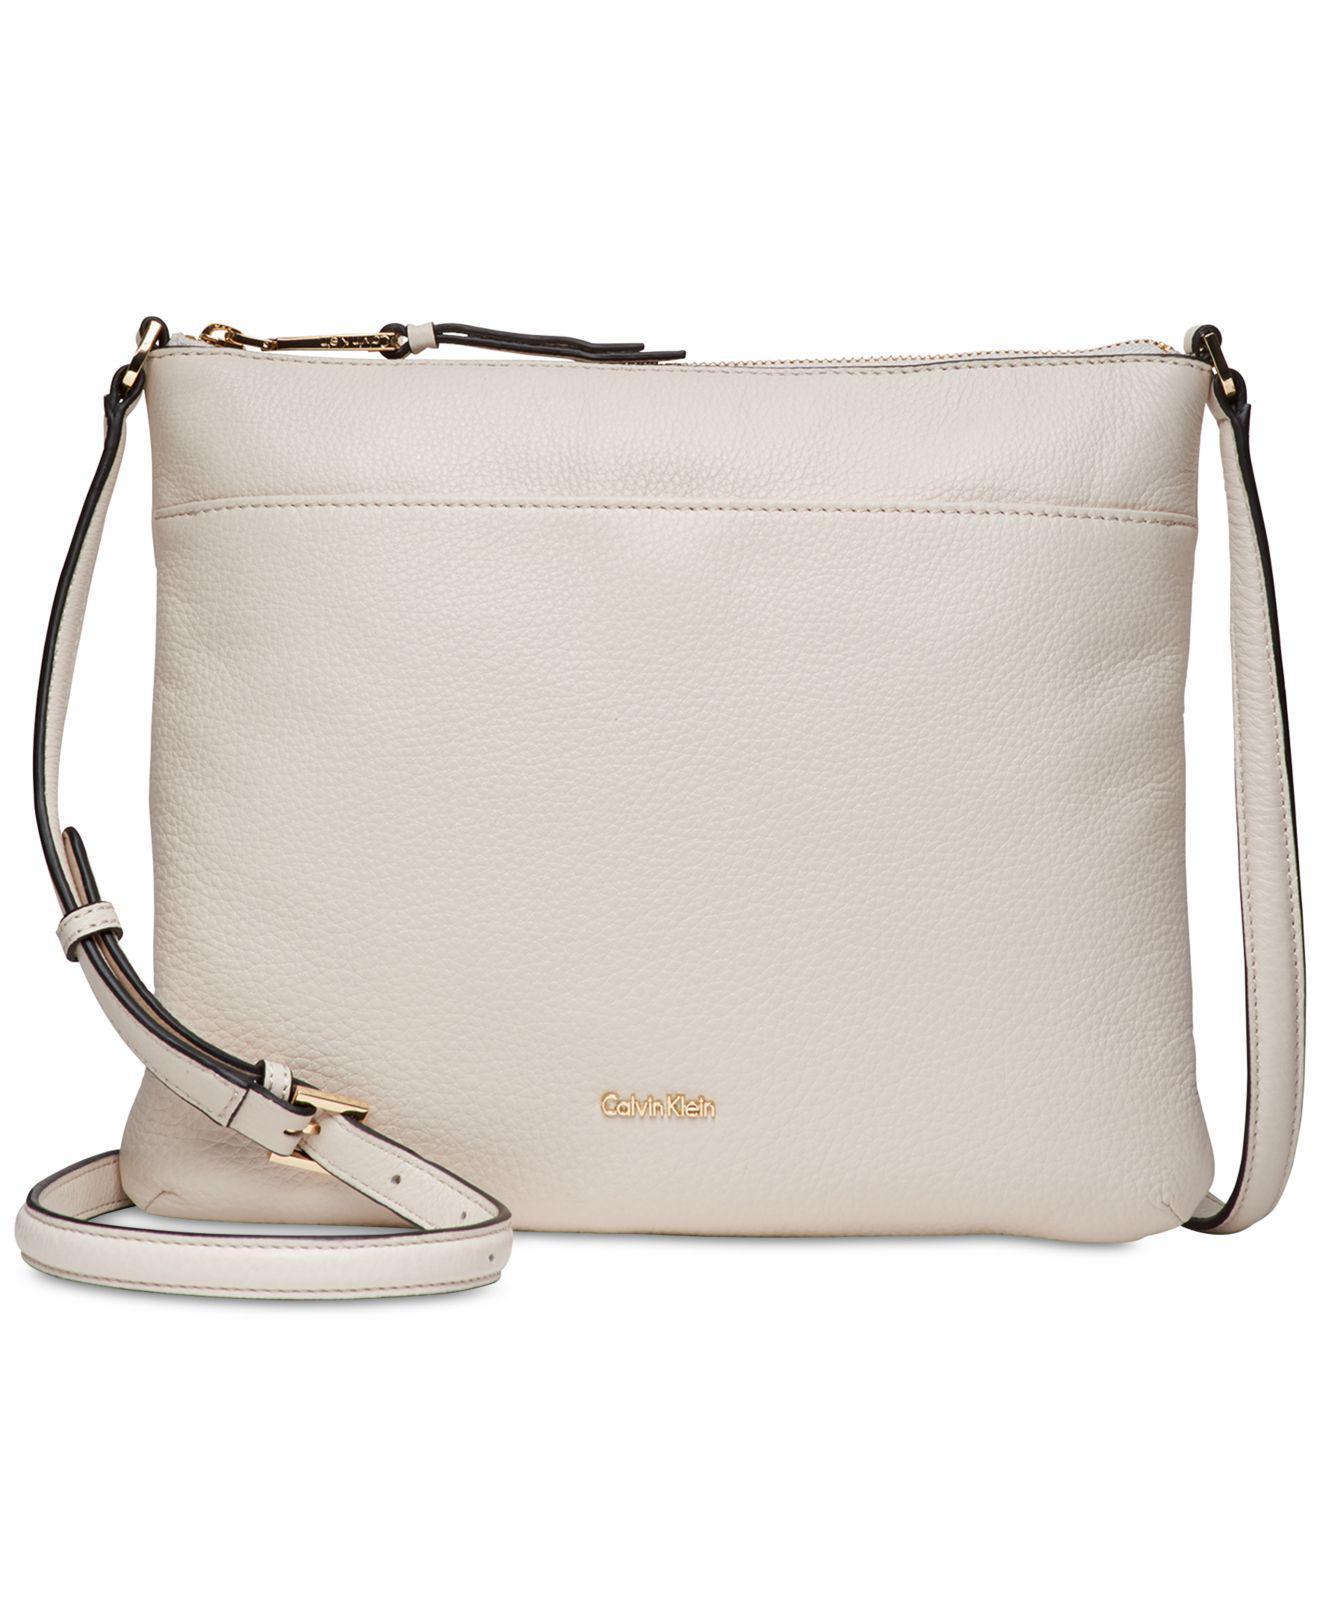 e37e5e2e6617 Calvin Klein - White Pebble Leather Lily Crossbody - Lyst. View fullscreen